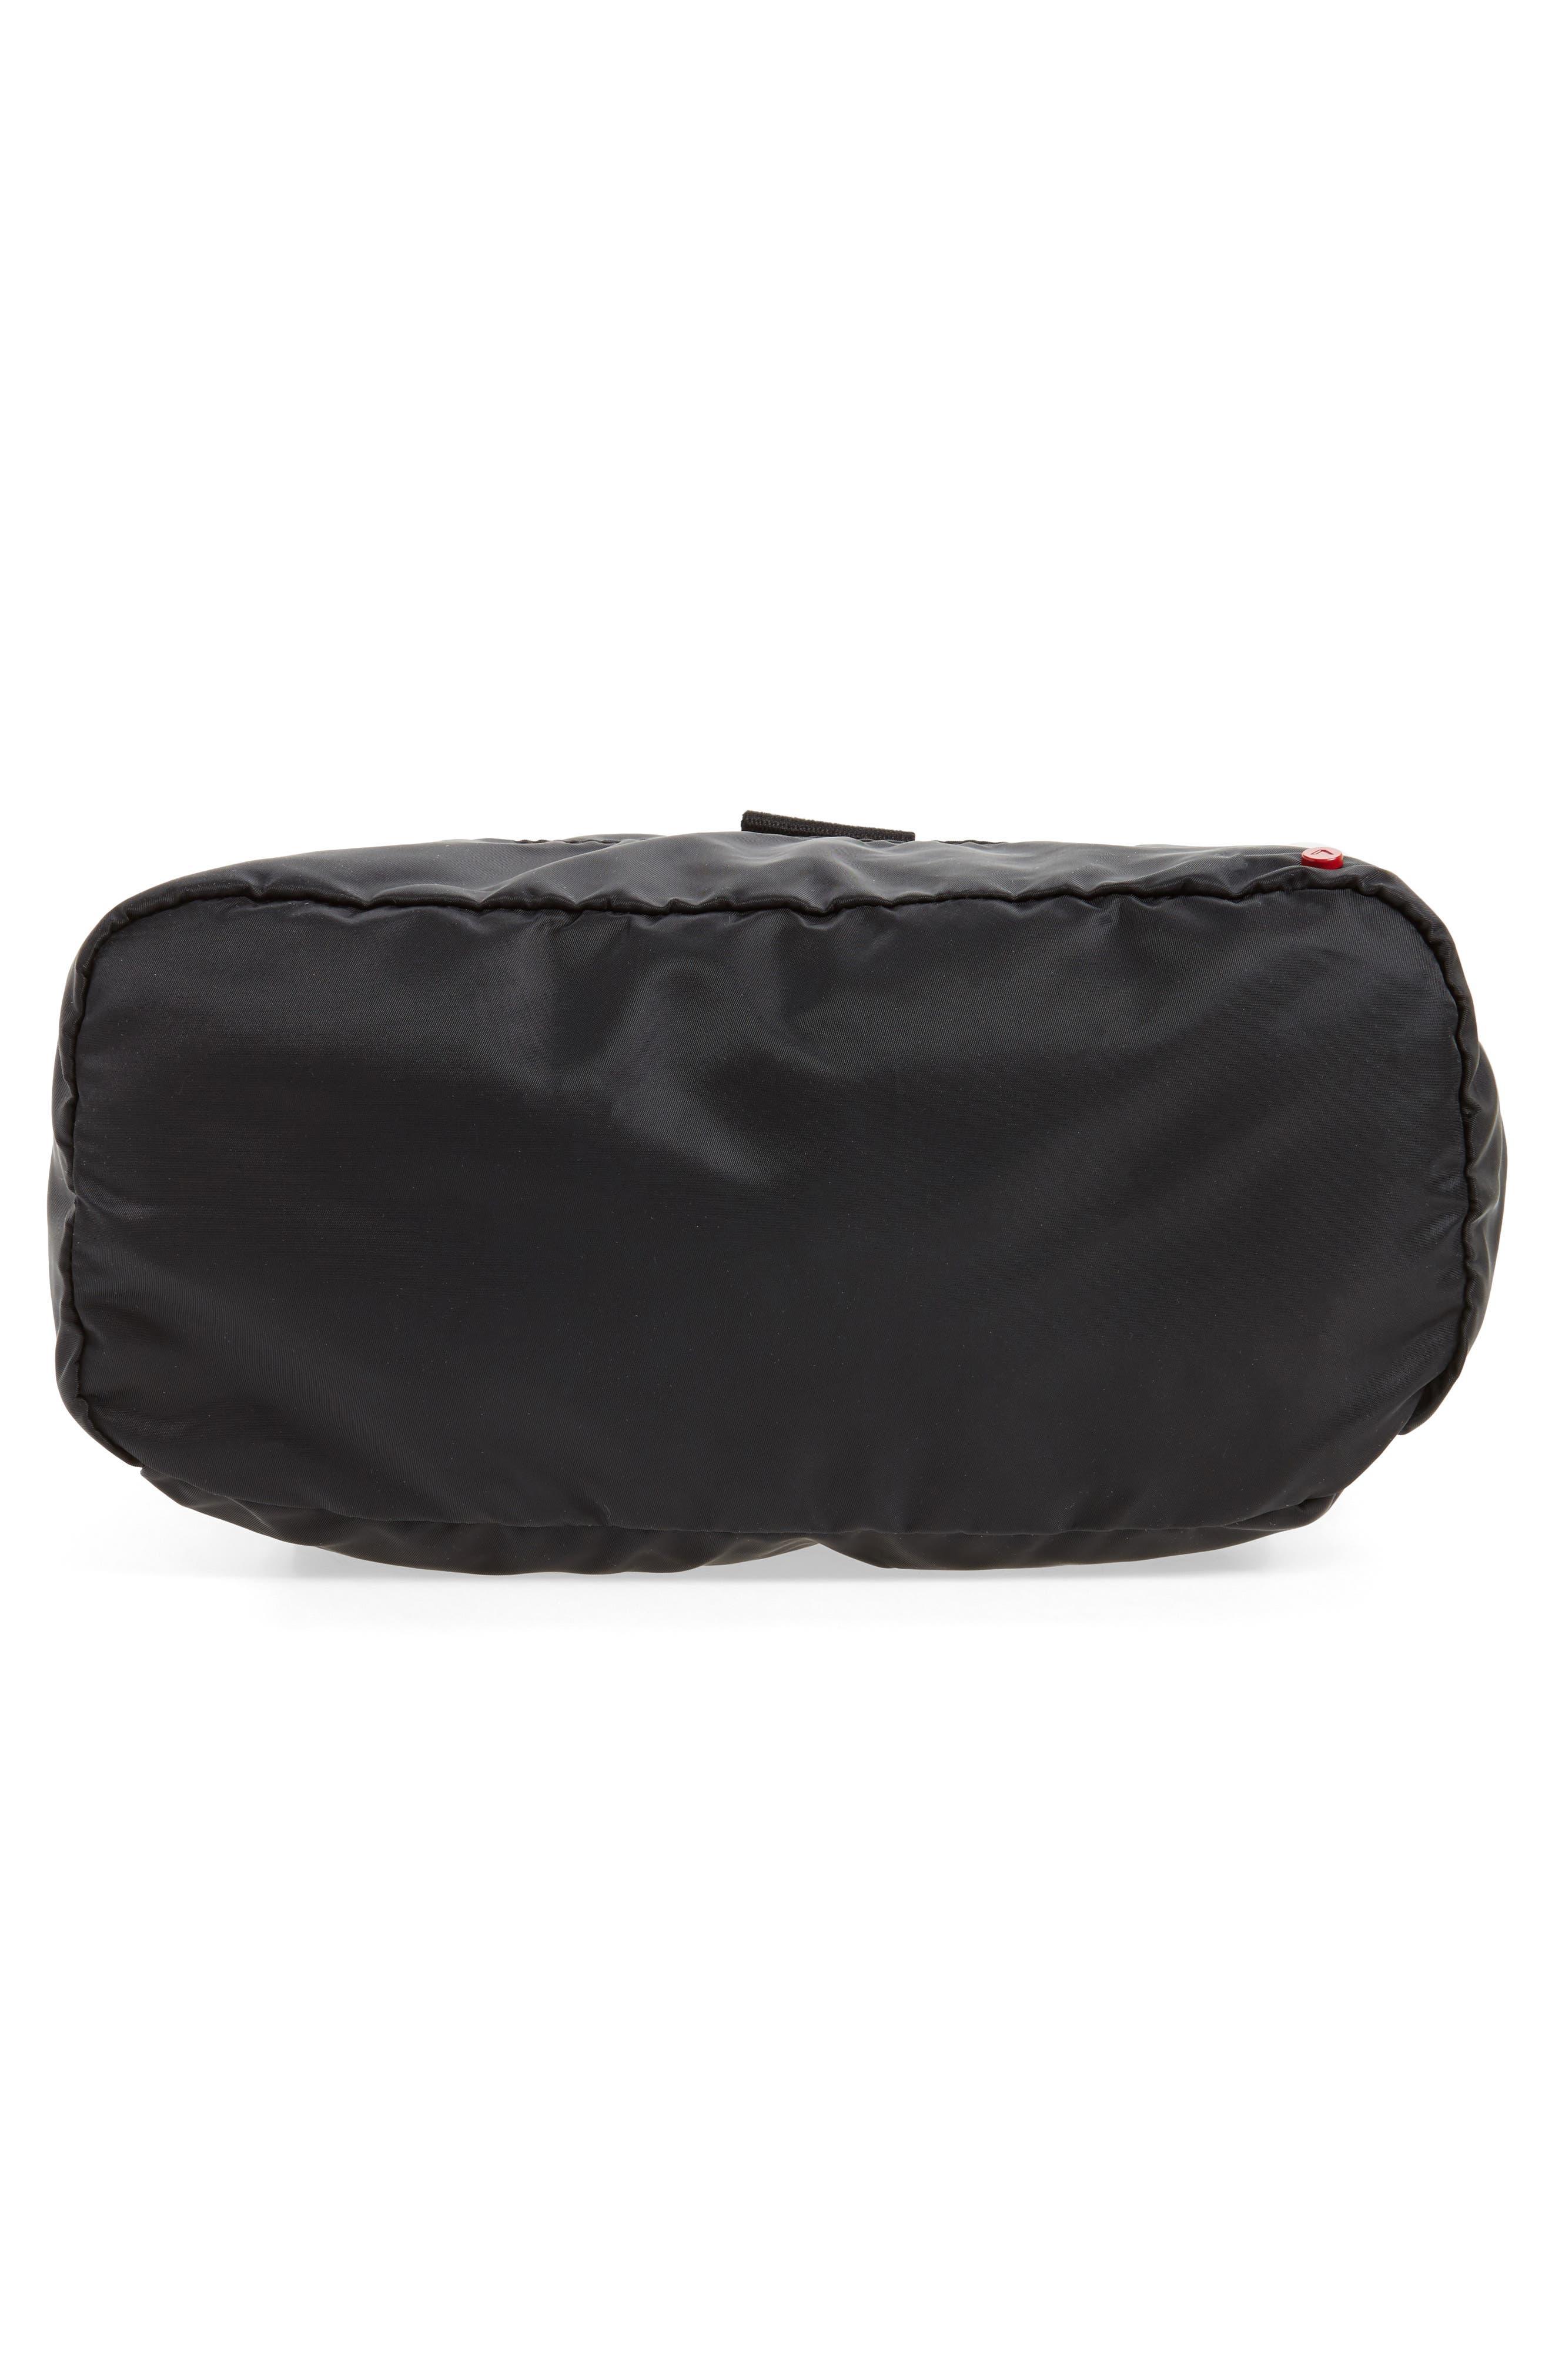 Bond Heights Packable Nylon Backpack,                             Alternate thumbnail 6, color,                             001